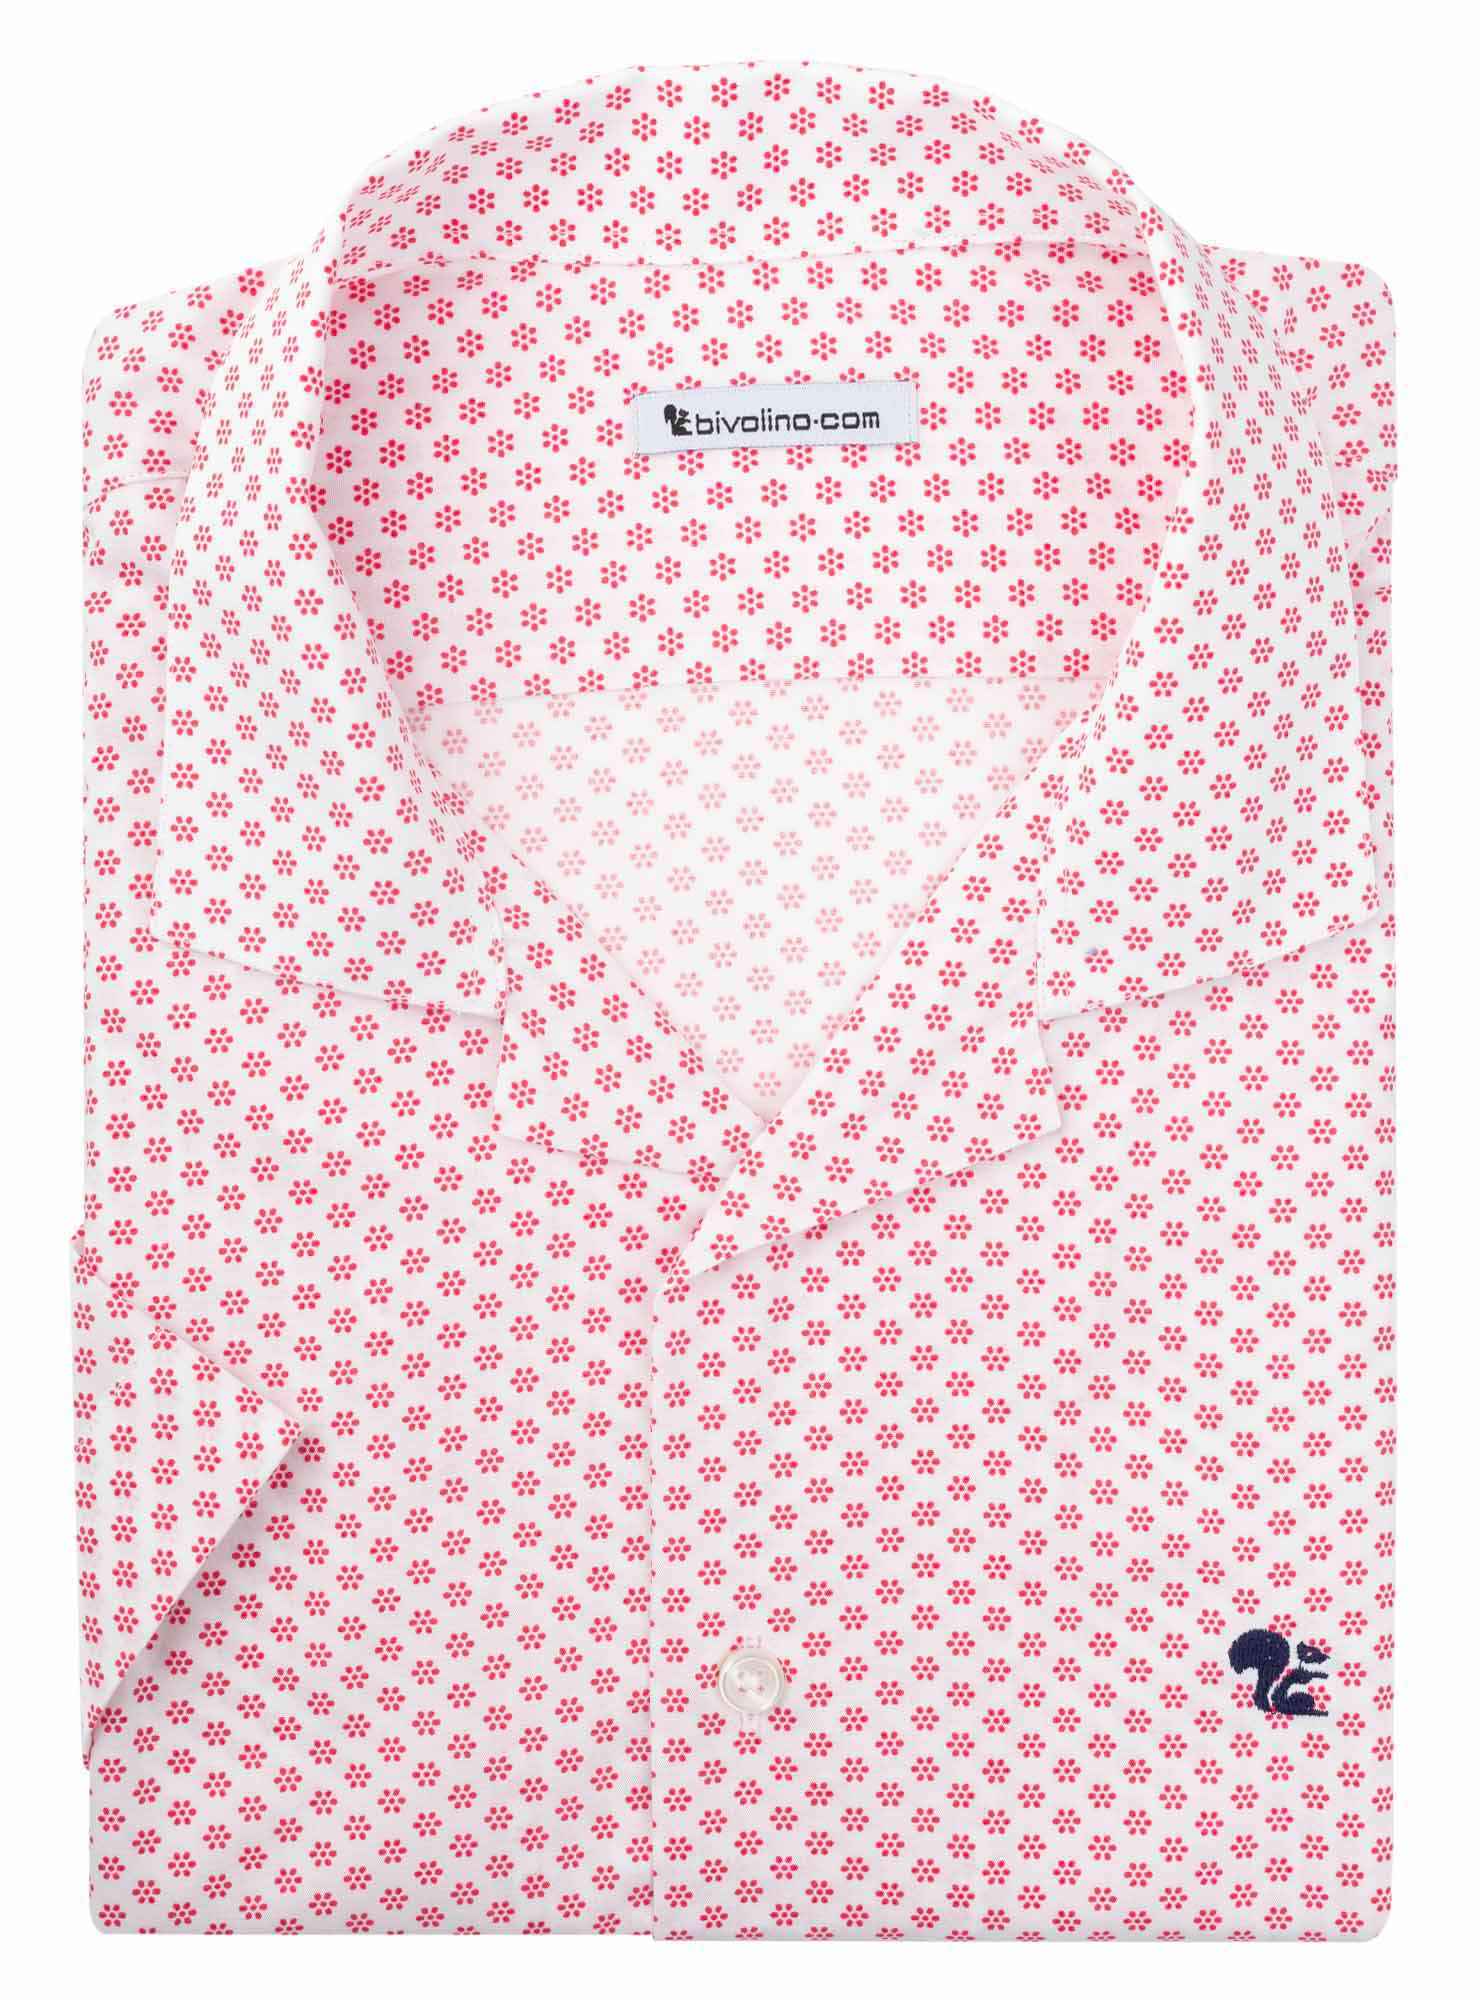 Niwani - cotton hawaiian shirt - Manio 3